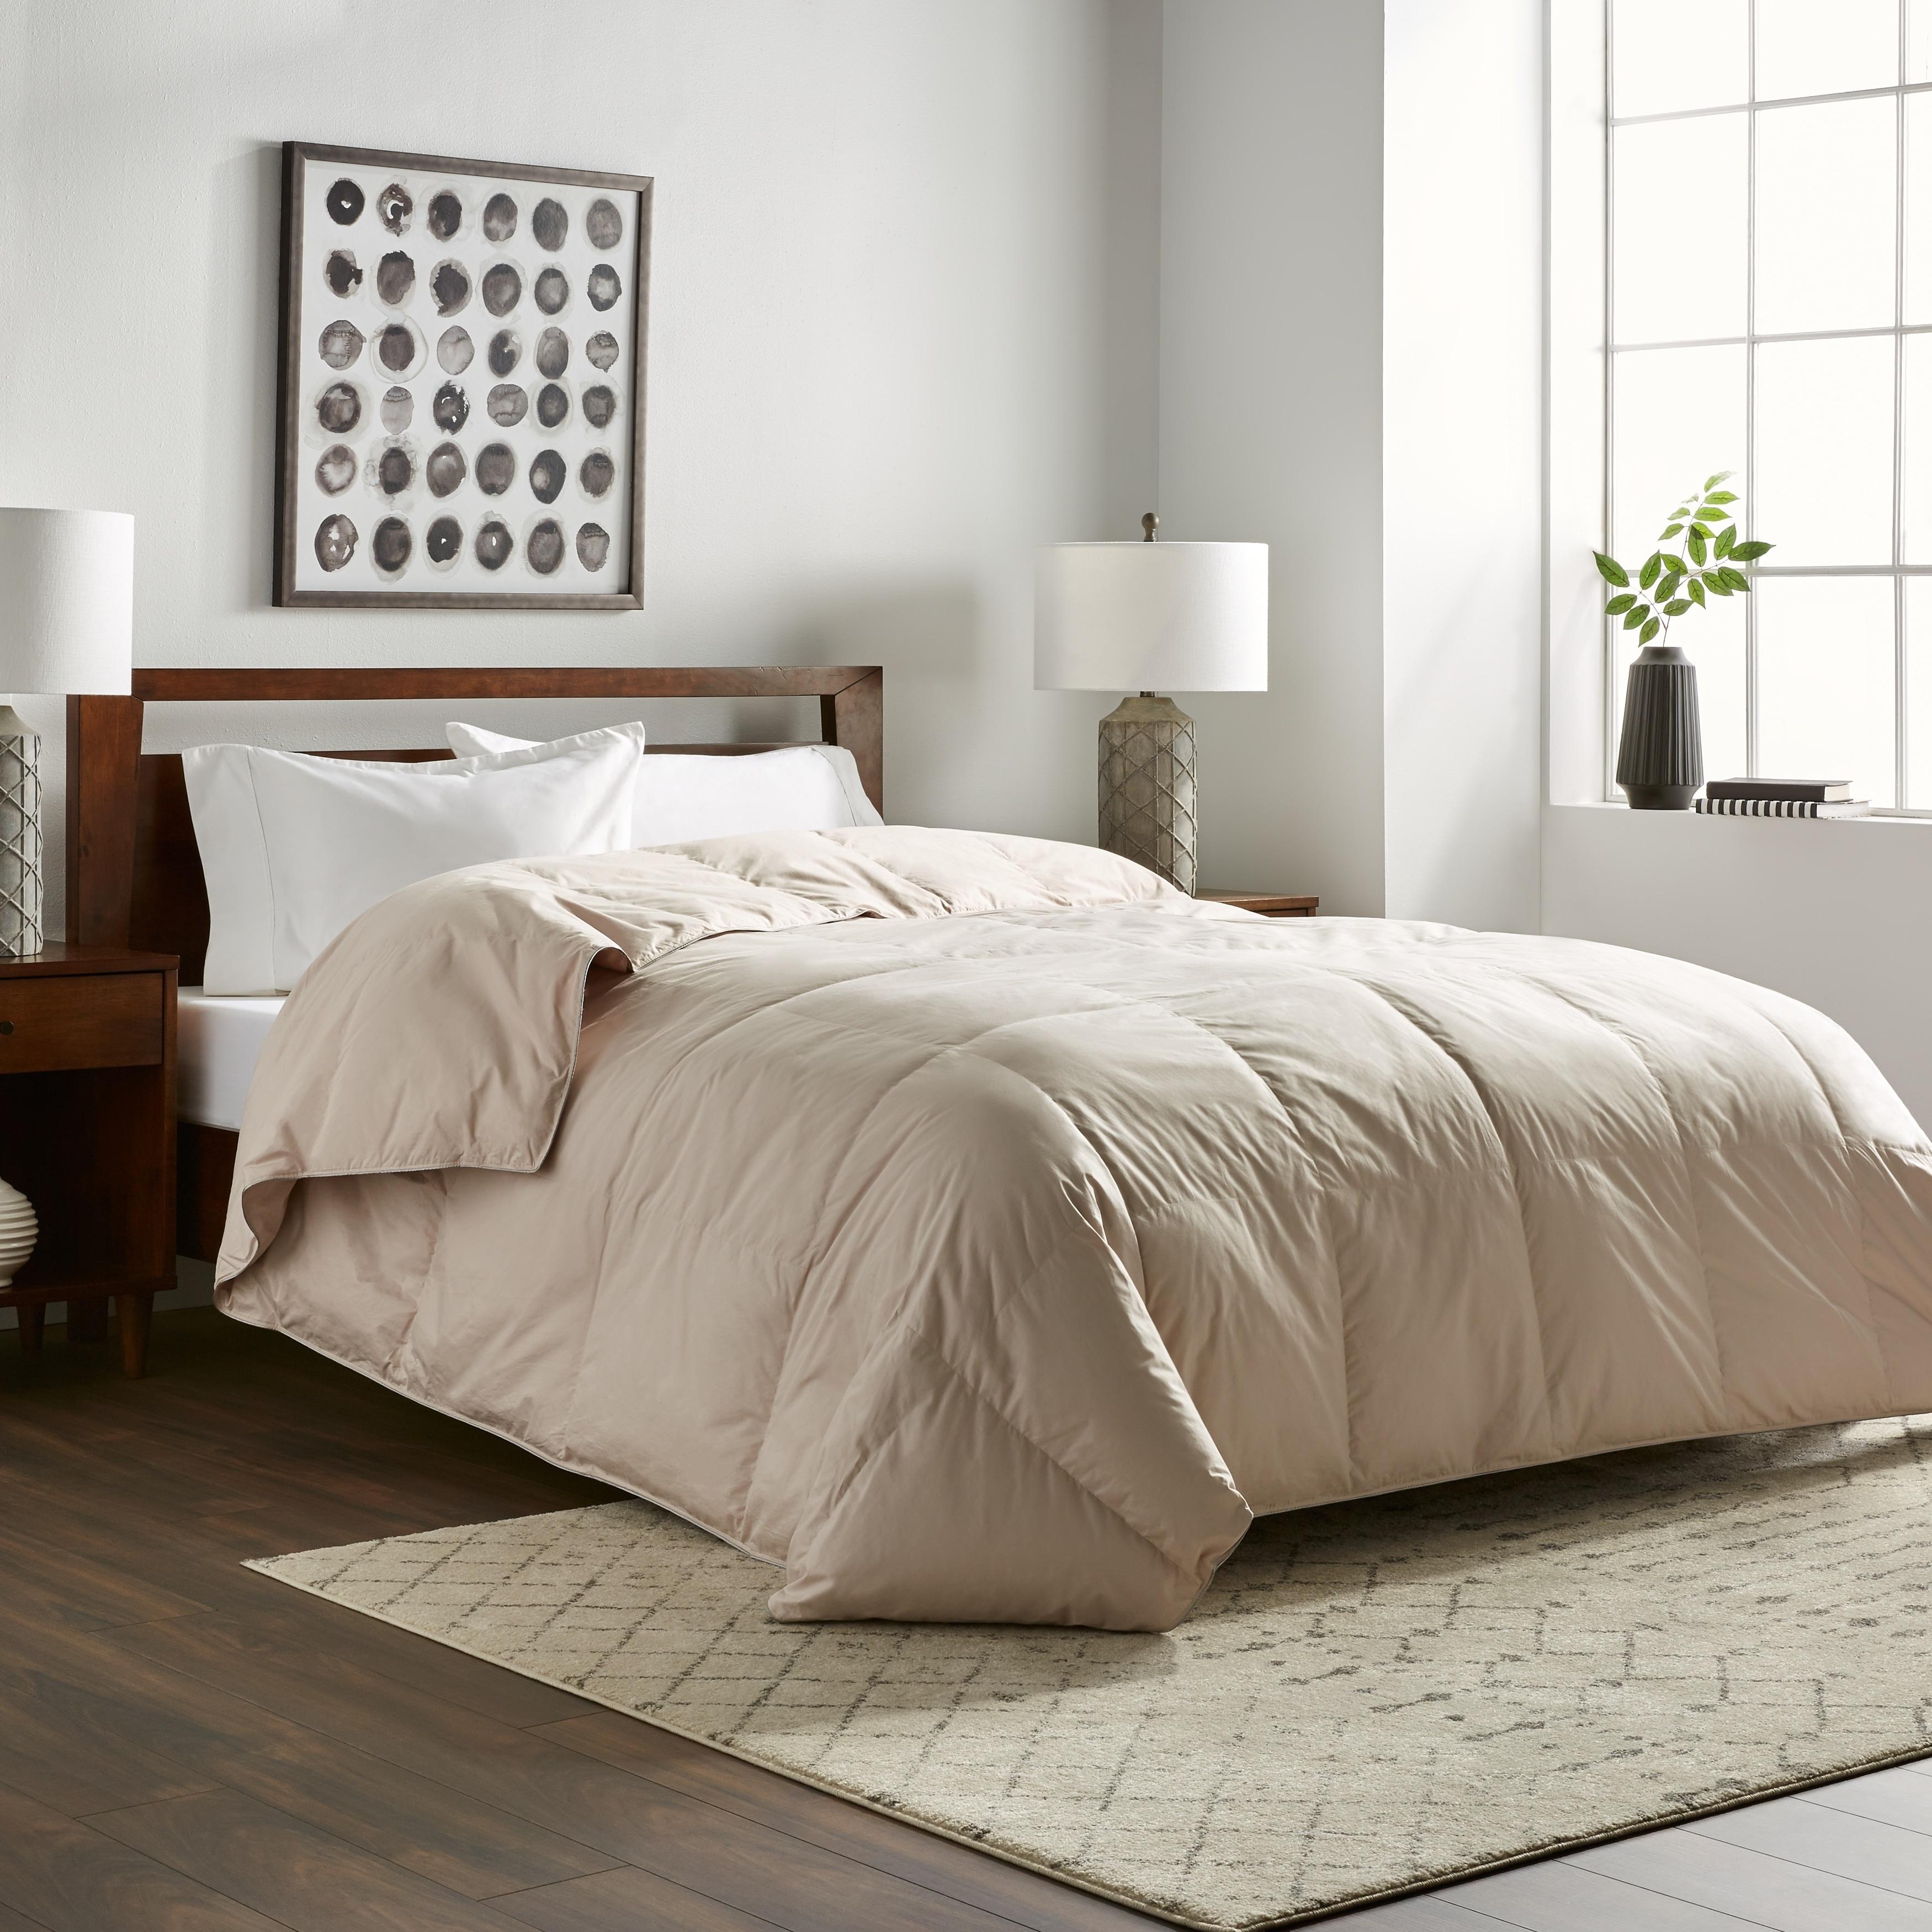 Nikki Chu Soft Clay White Down Comforter Overstock 13009713 Twin